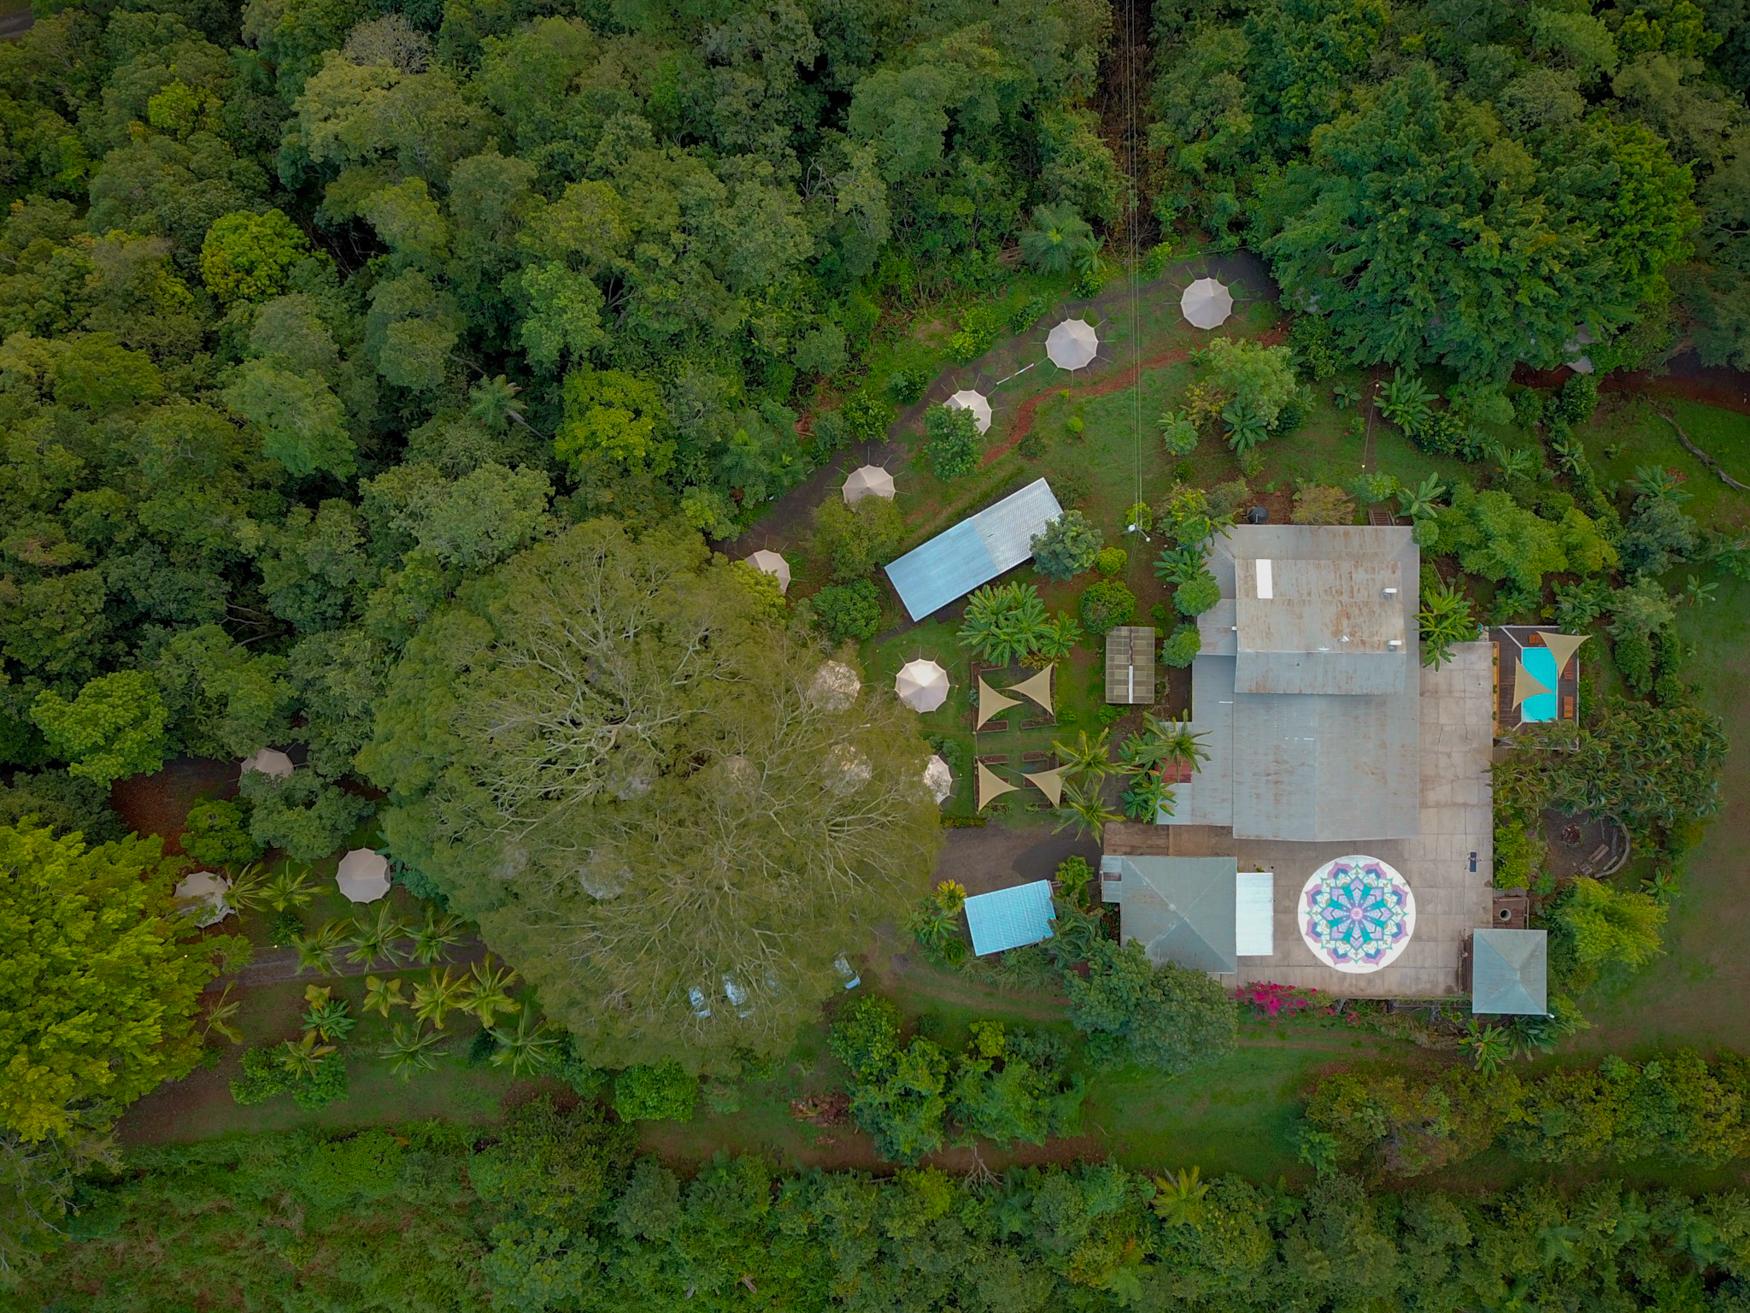 Yoga-Retreat-Drone-Photography-Costa-Rica-30.jpg